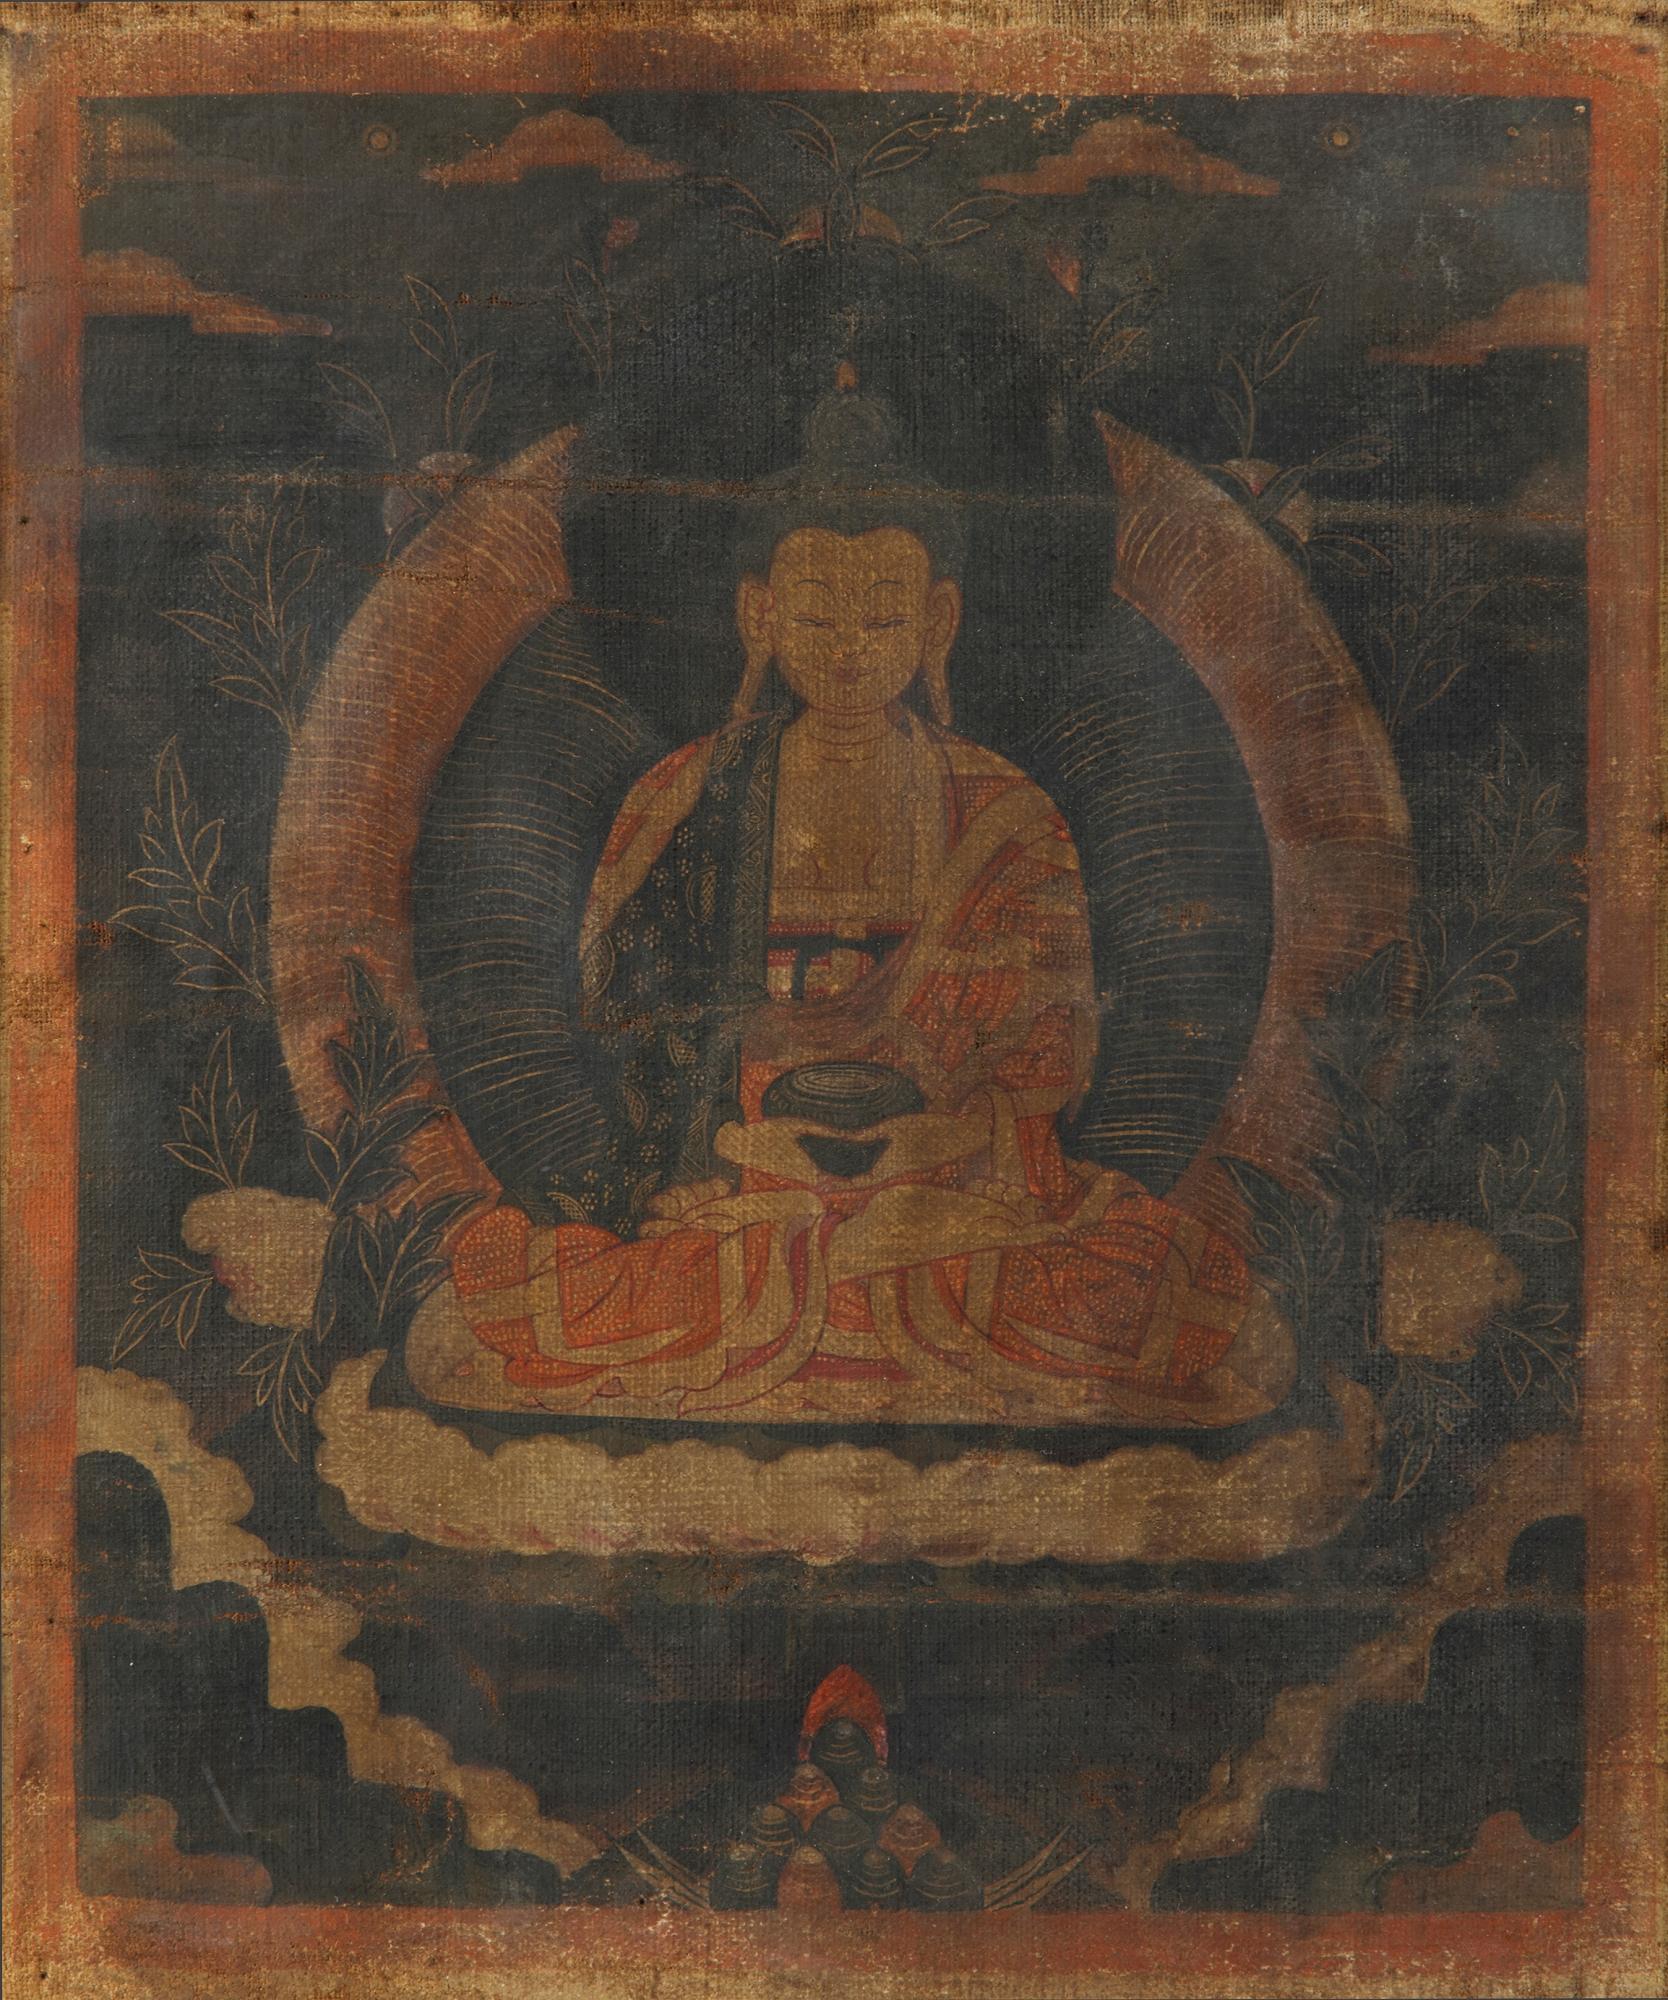 Los 60 - A Tibetan thangka of Shakyamuni